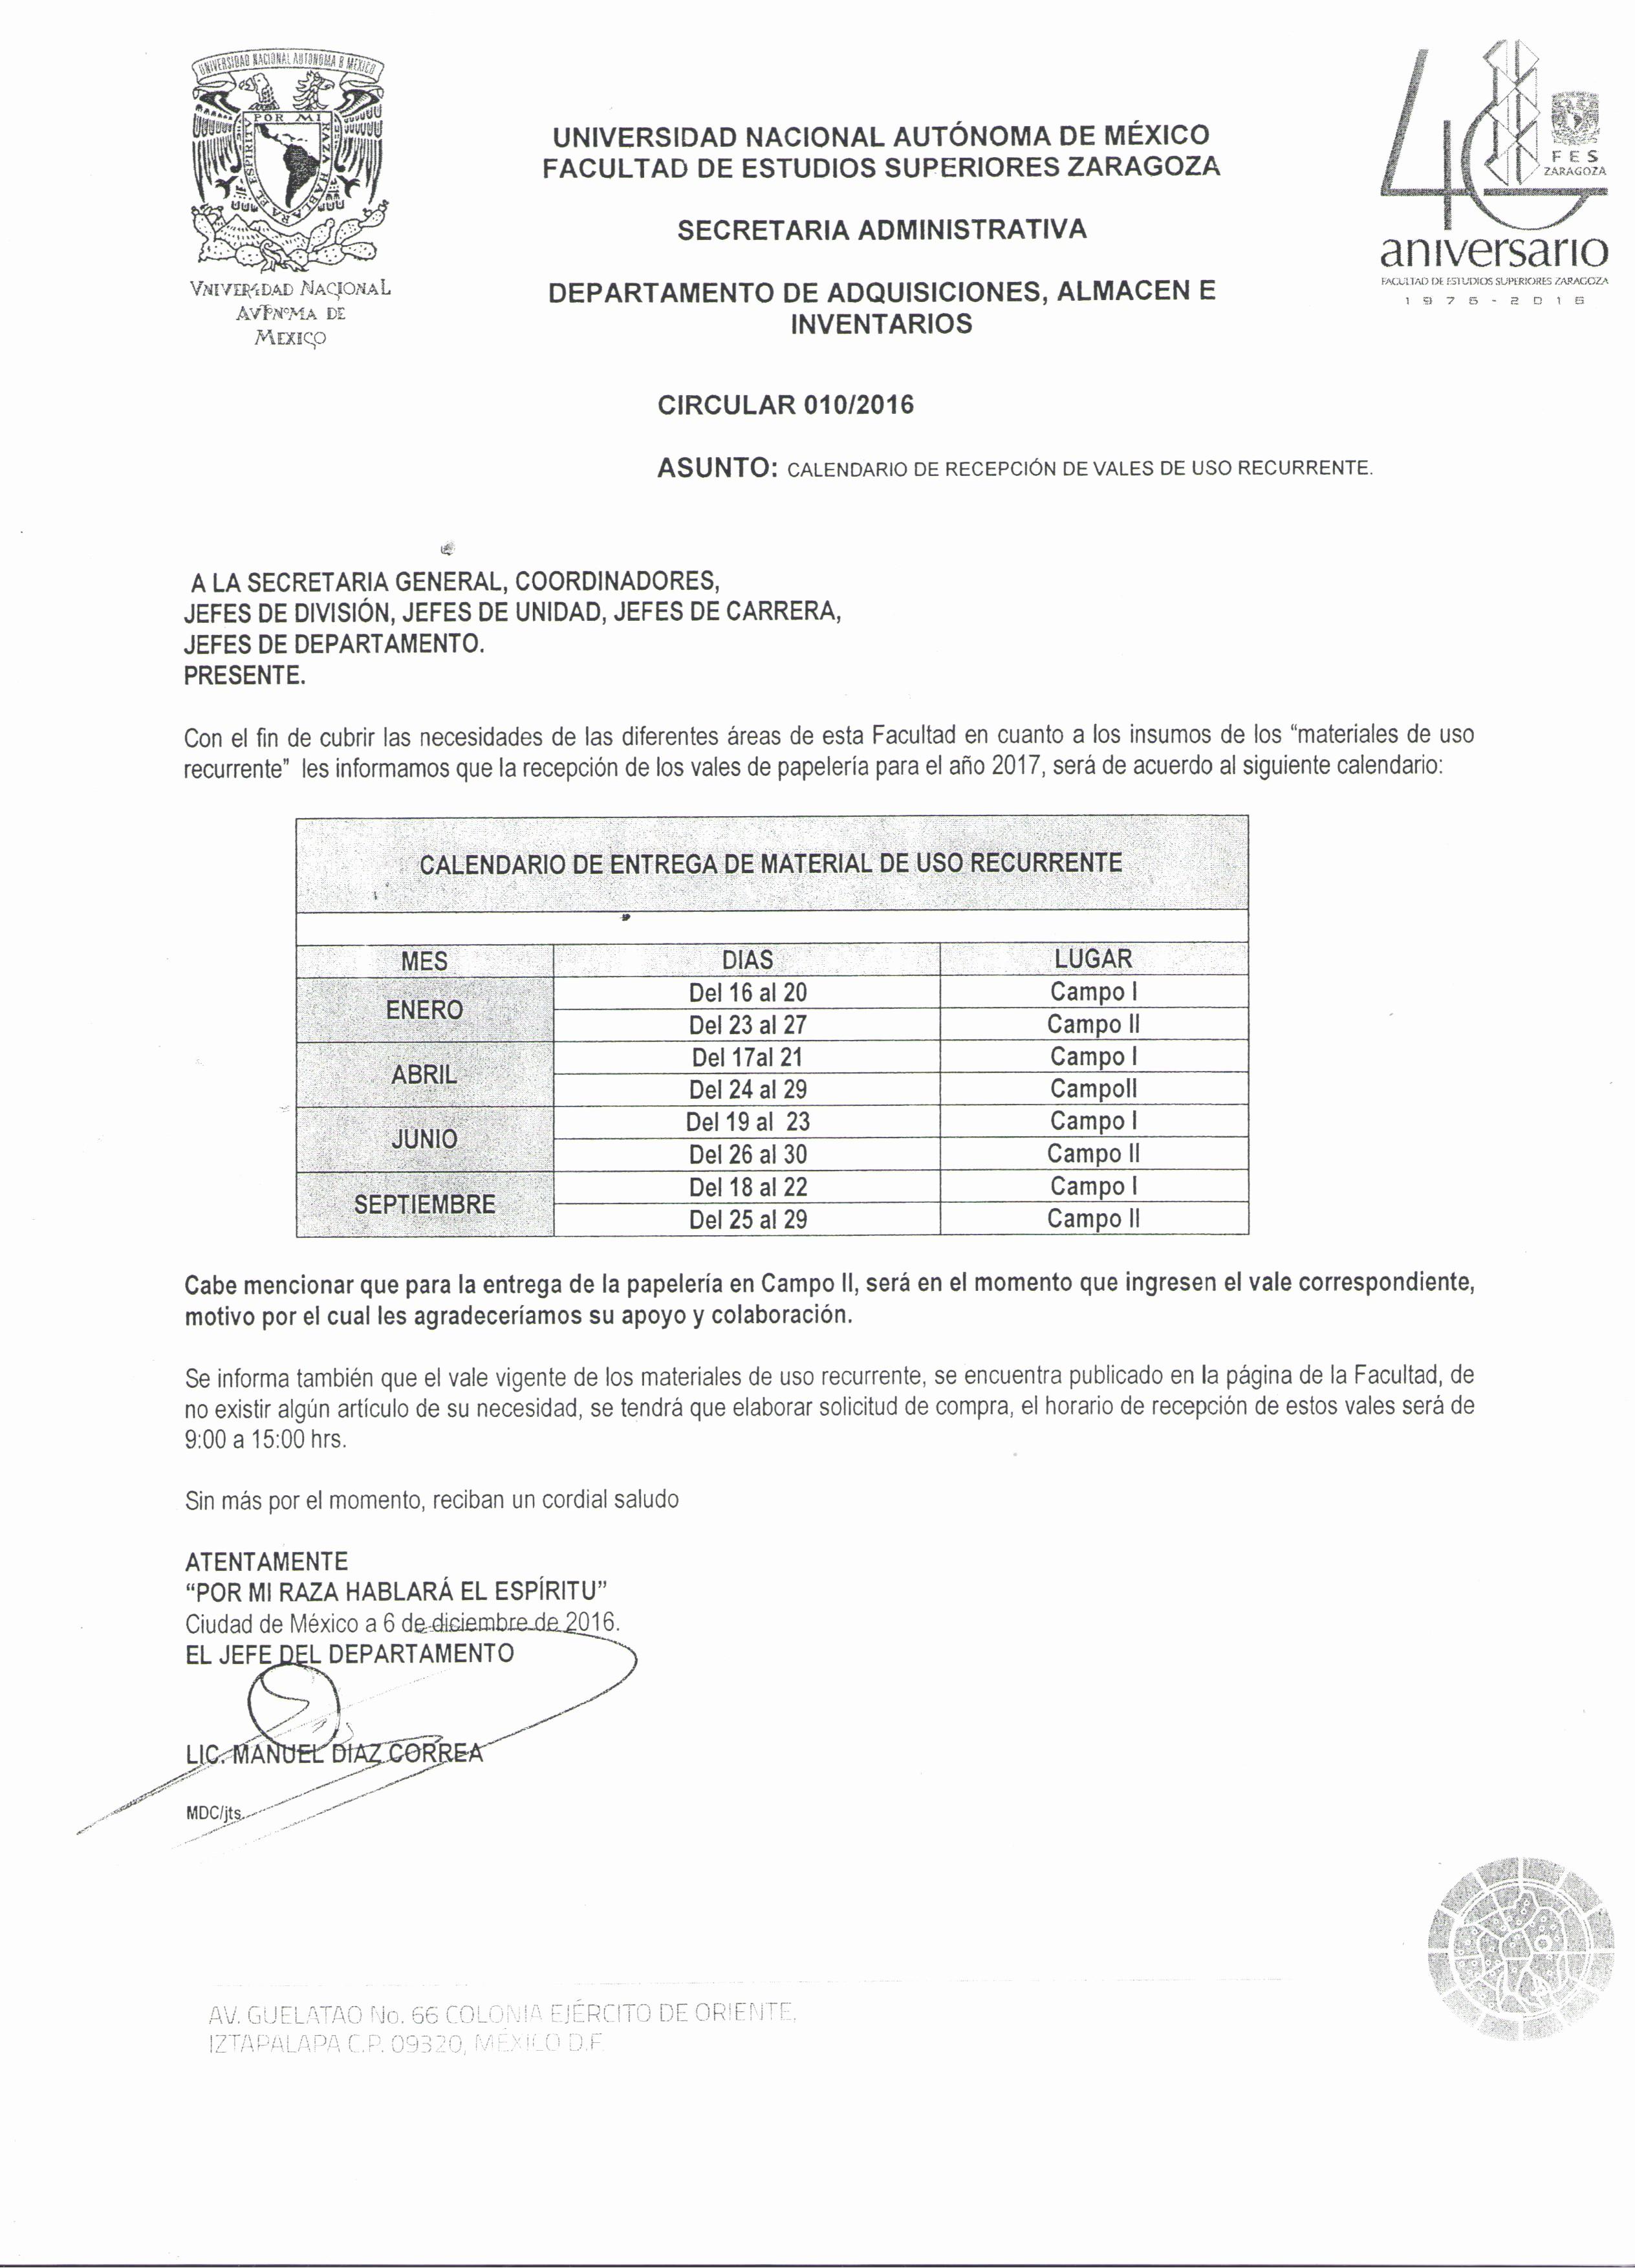 Formato Para Salida De Almacen Inspirational Departamento De Adquisiciones AlmacÉn E Inventarios